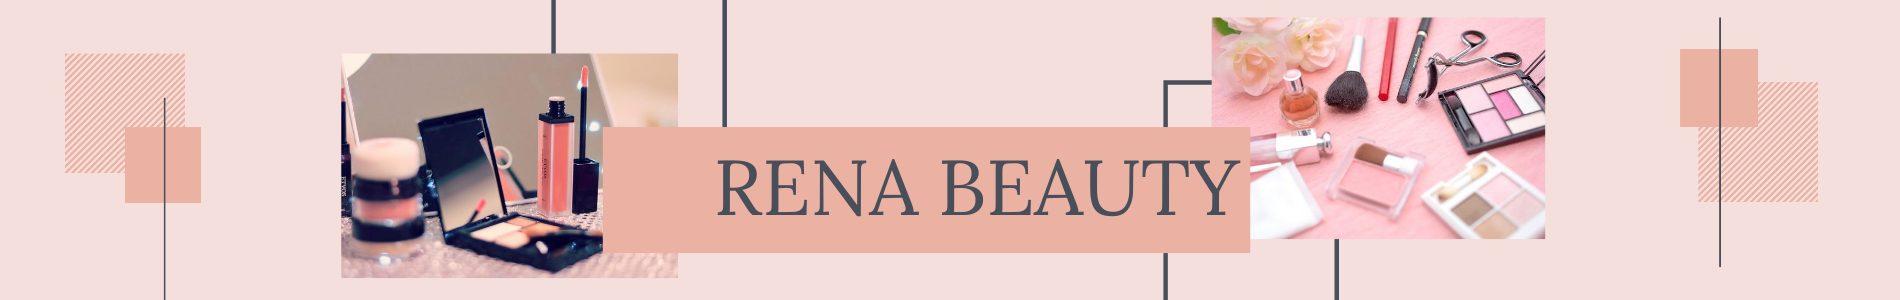 RENA BEAUTY